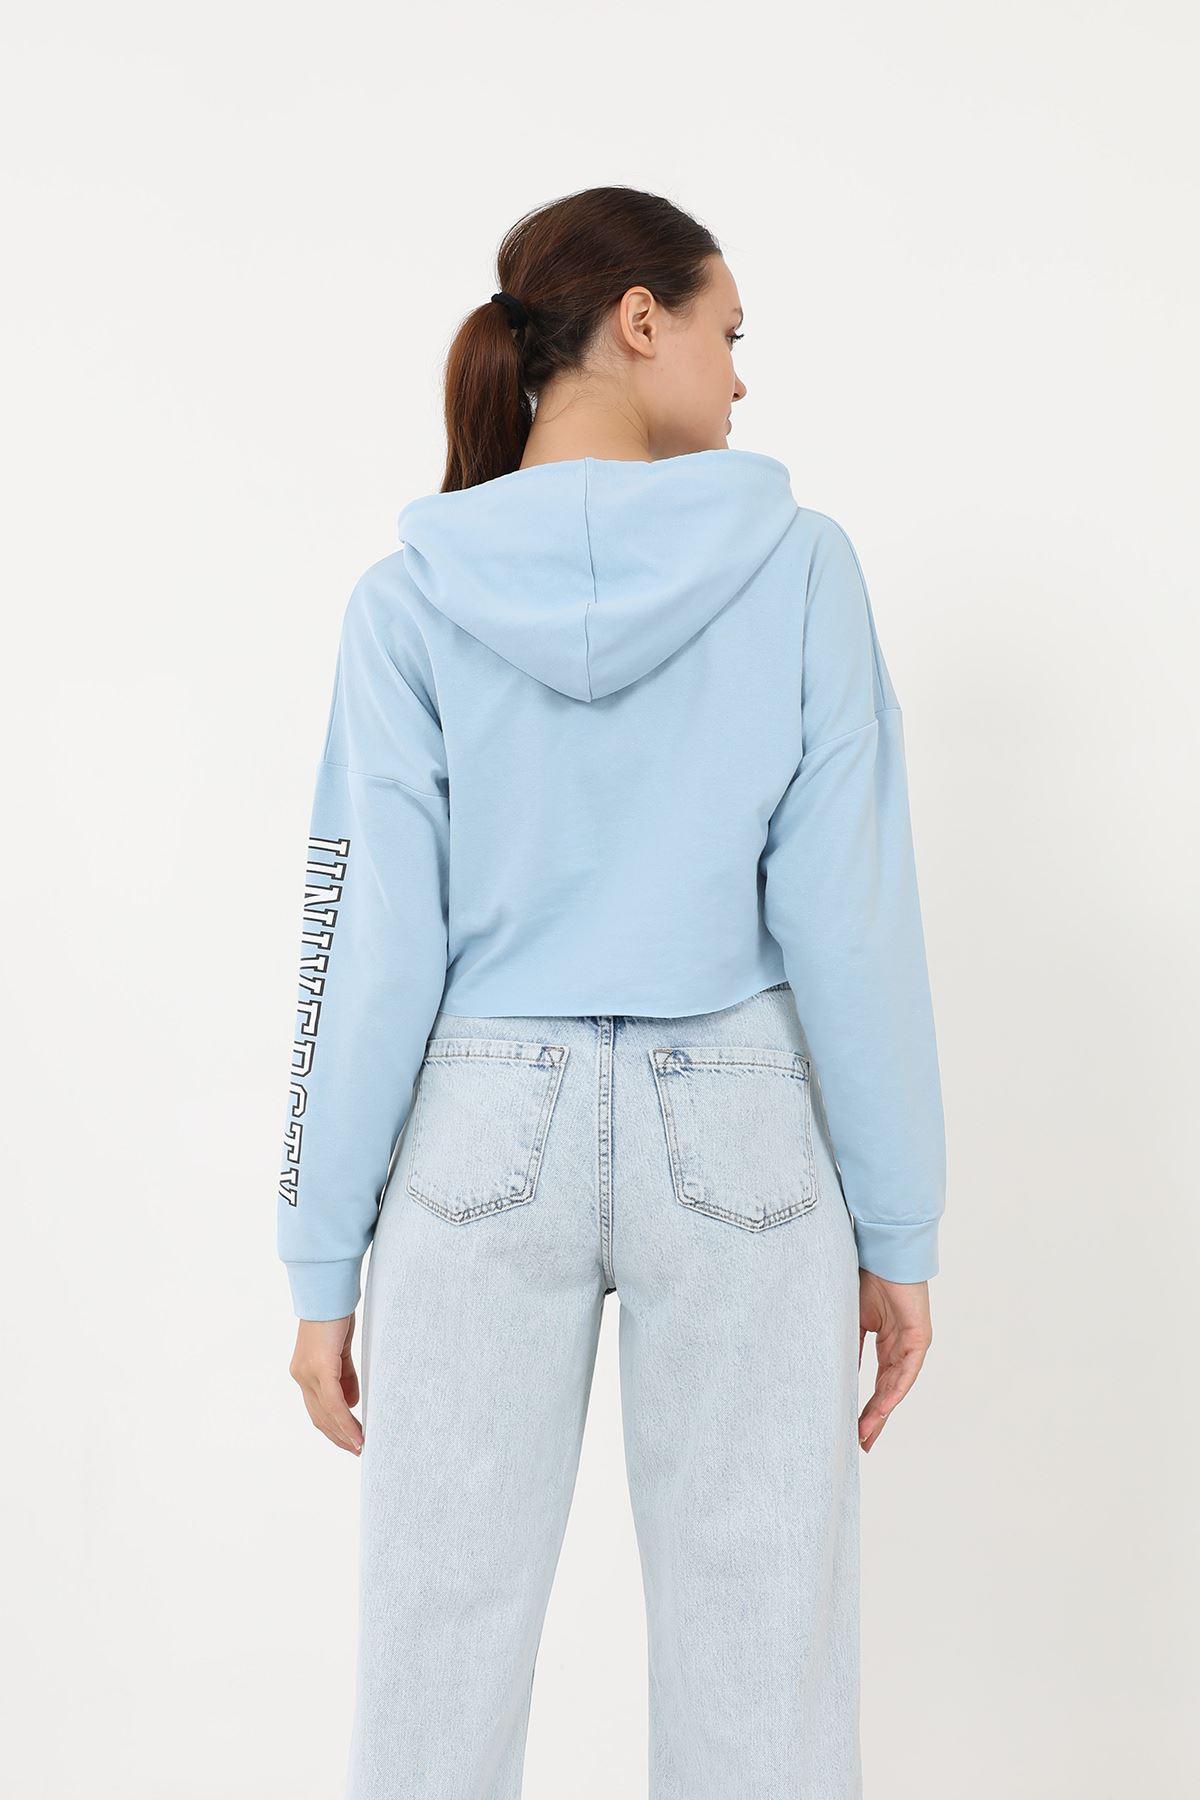 Kapşonlu Crop Sweathsirt-Mavi